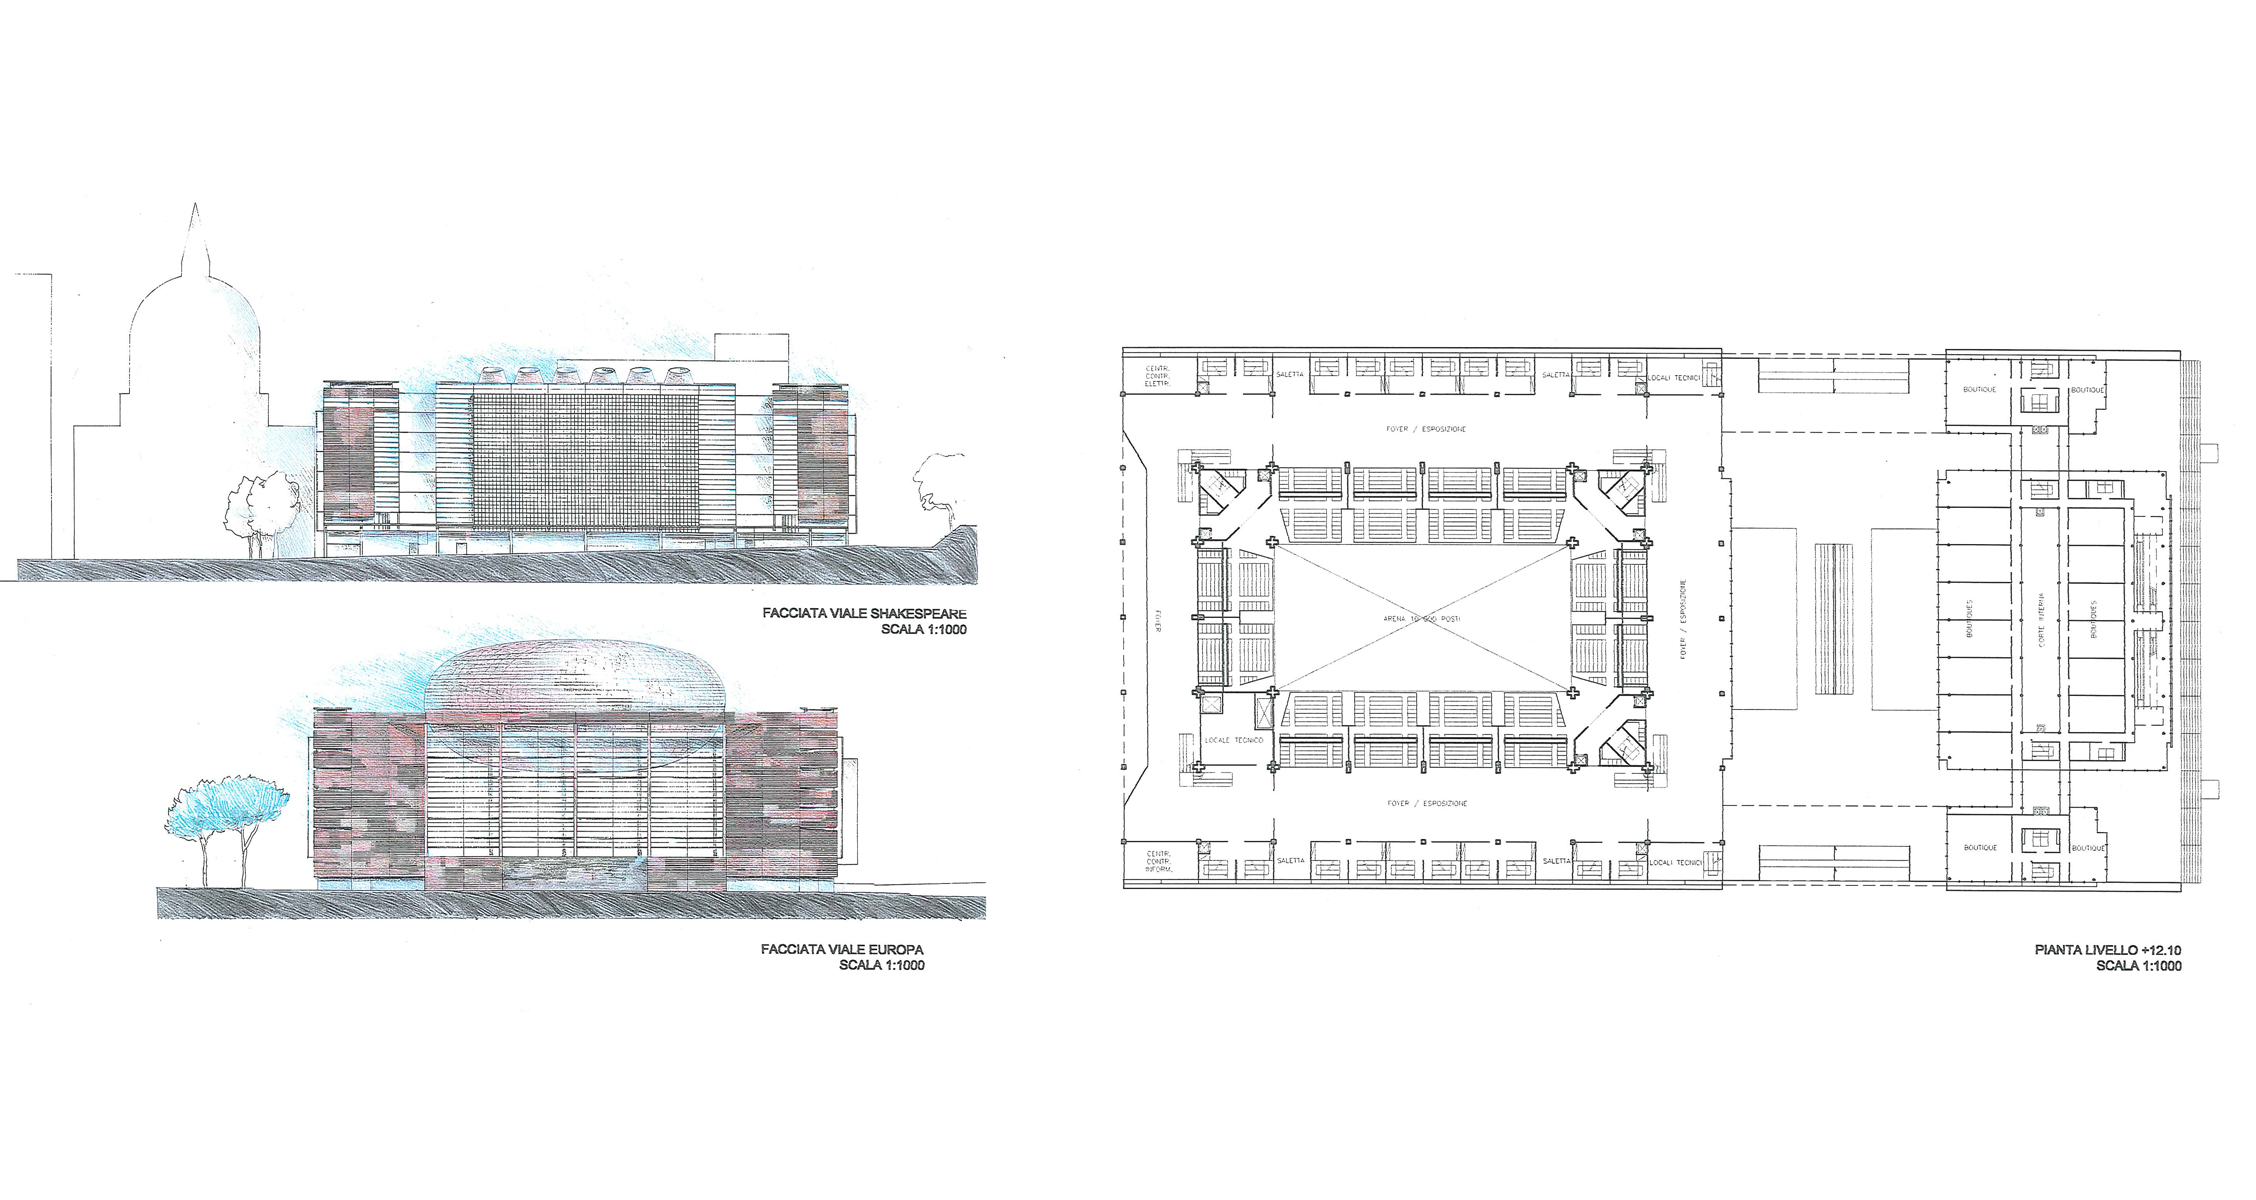 plan-salles-et-elevations-transversales_slider